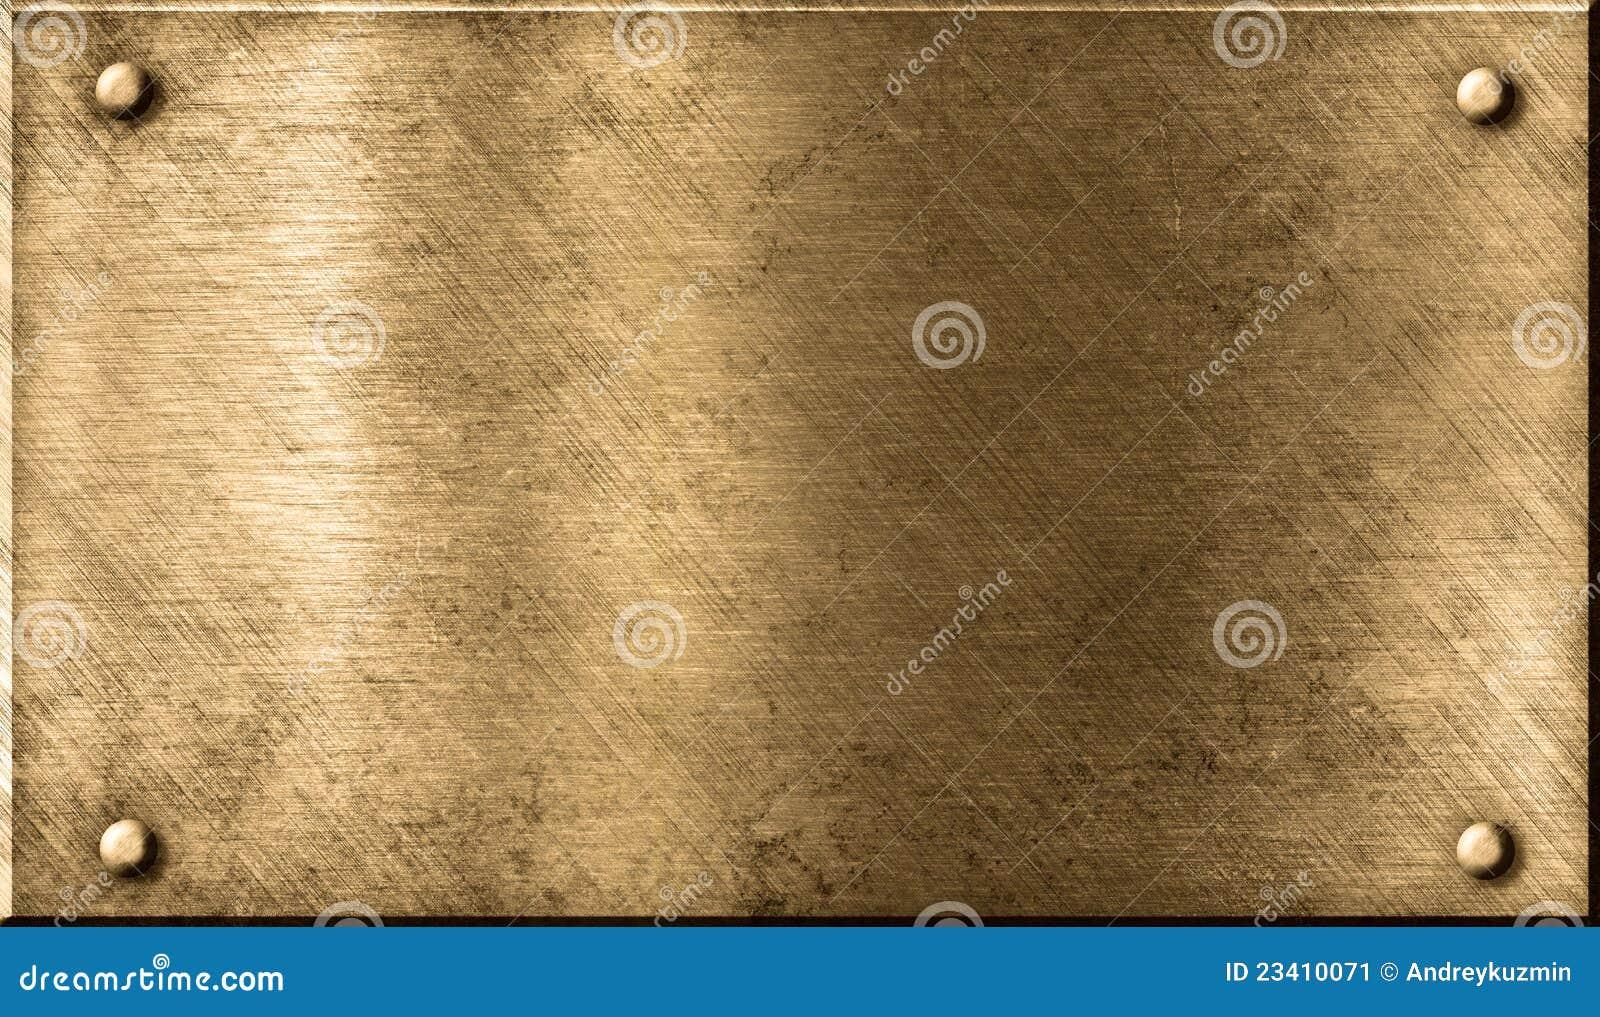 Grunge Metal Brass Or Bronze Background Stock Image